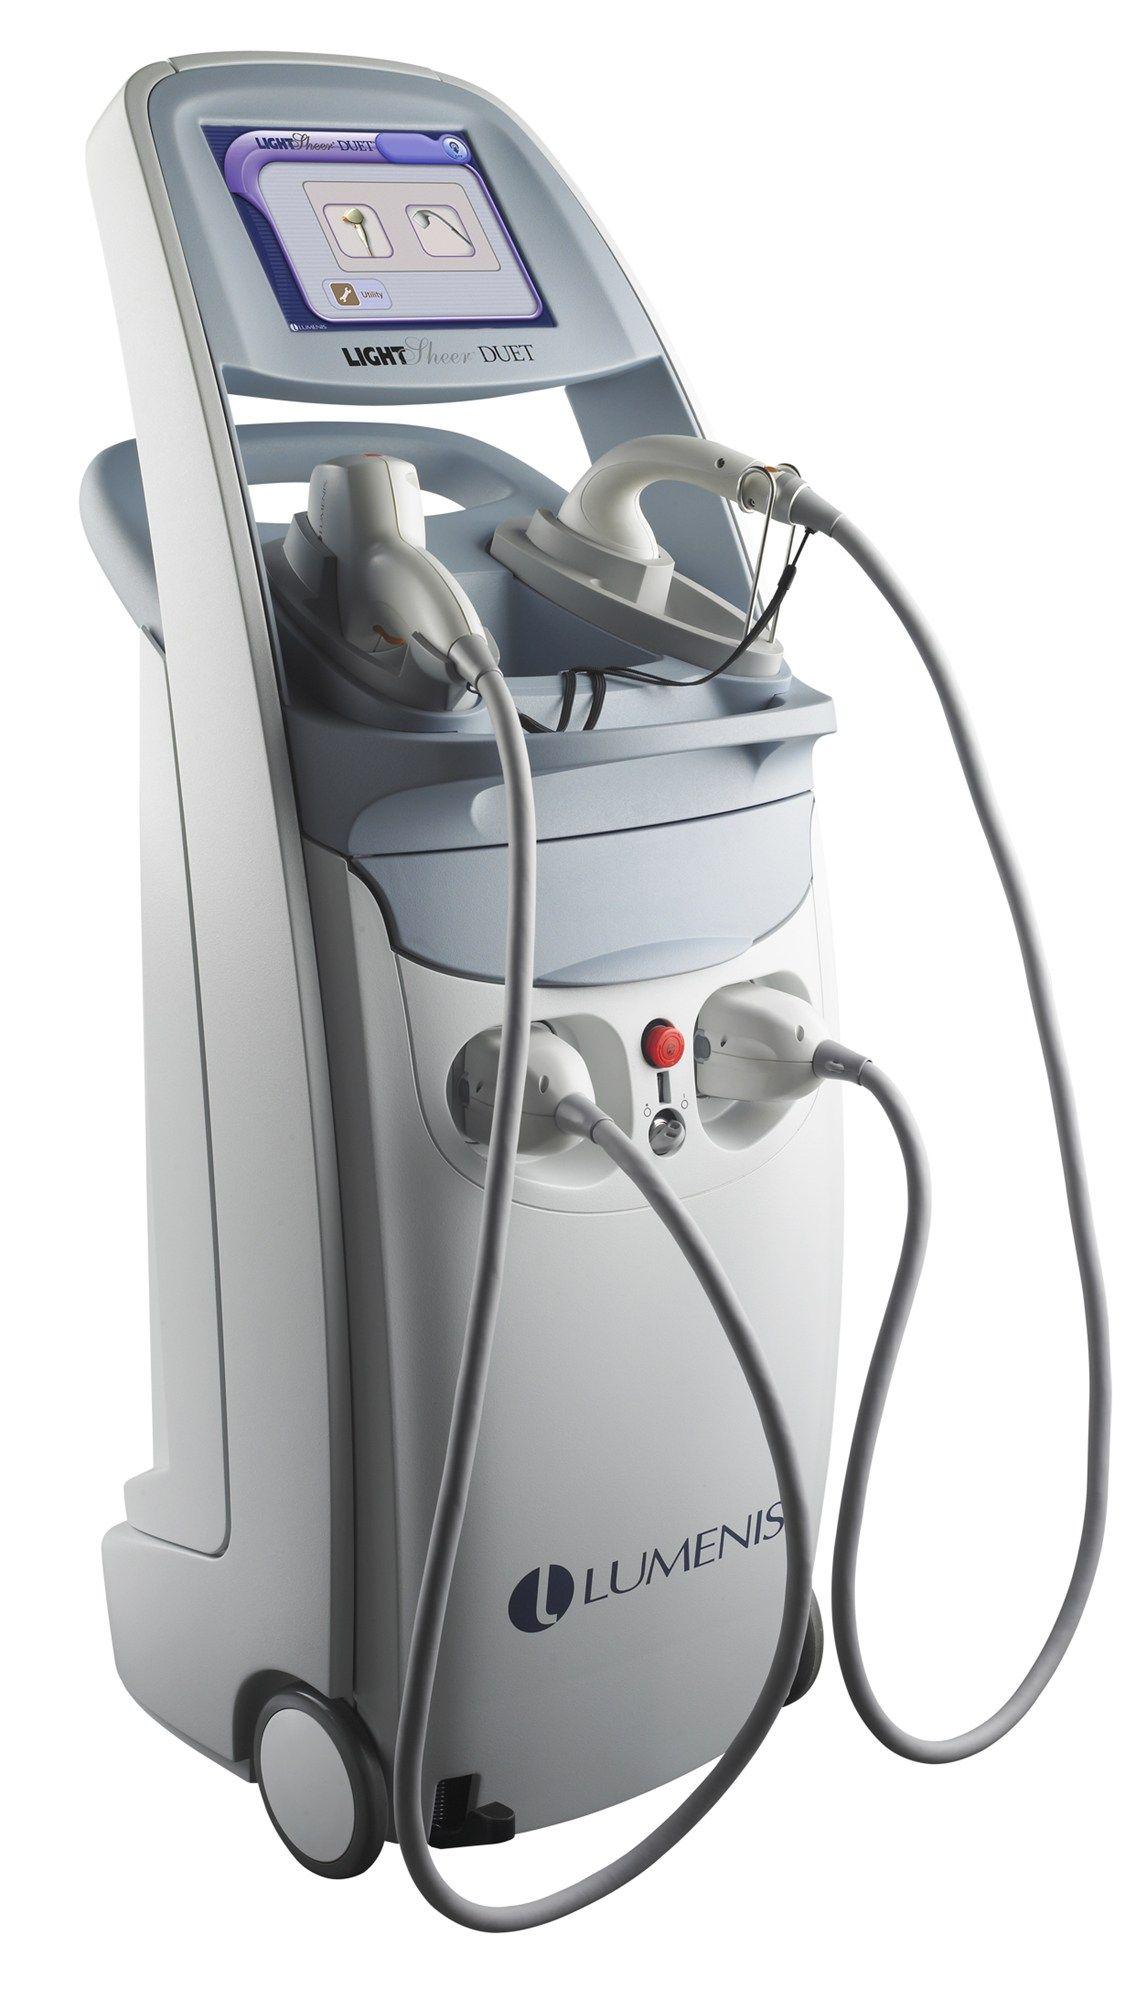 Lumenis LightSheer Duet Laser hair reduction, Hair